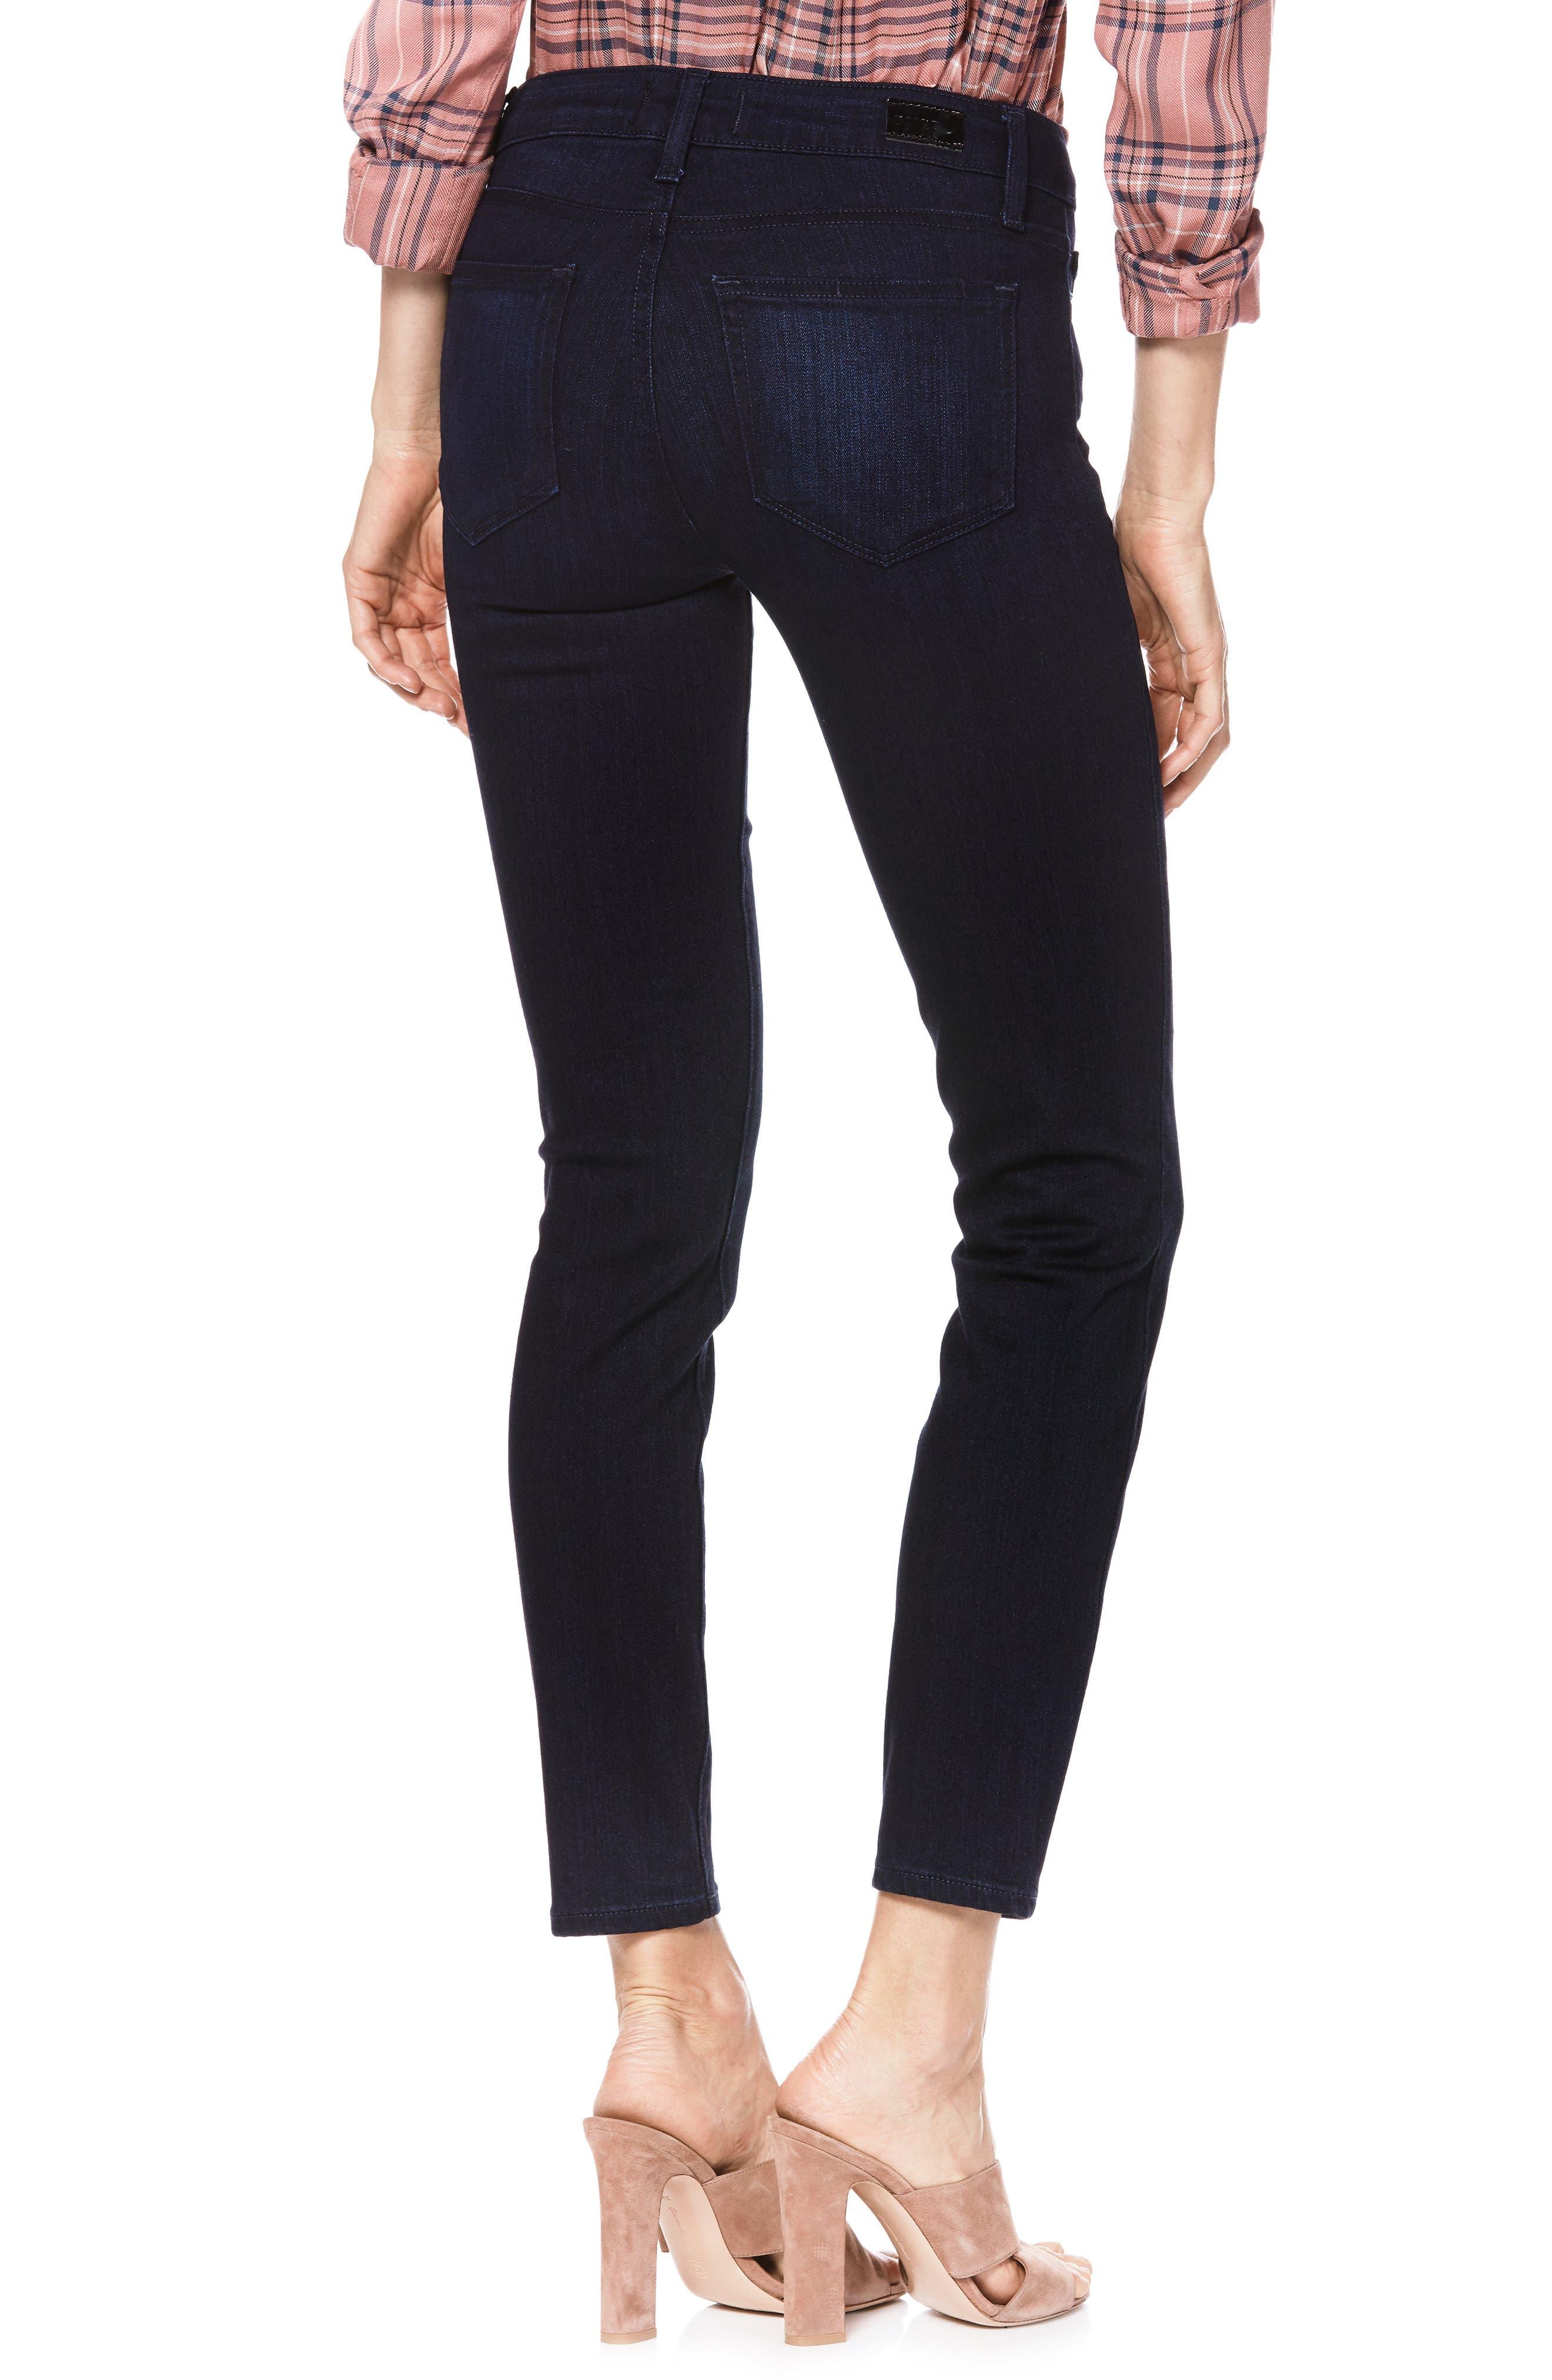 Transcend - Verdugo Ankle Skinny Jeans,                             Alternate thumbnail 2, color,                             LANA